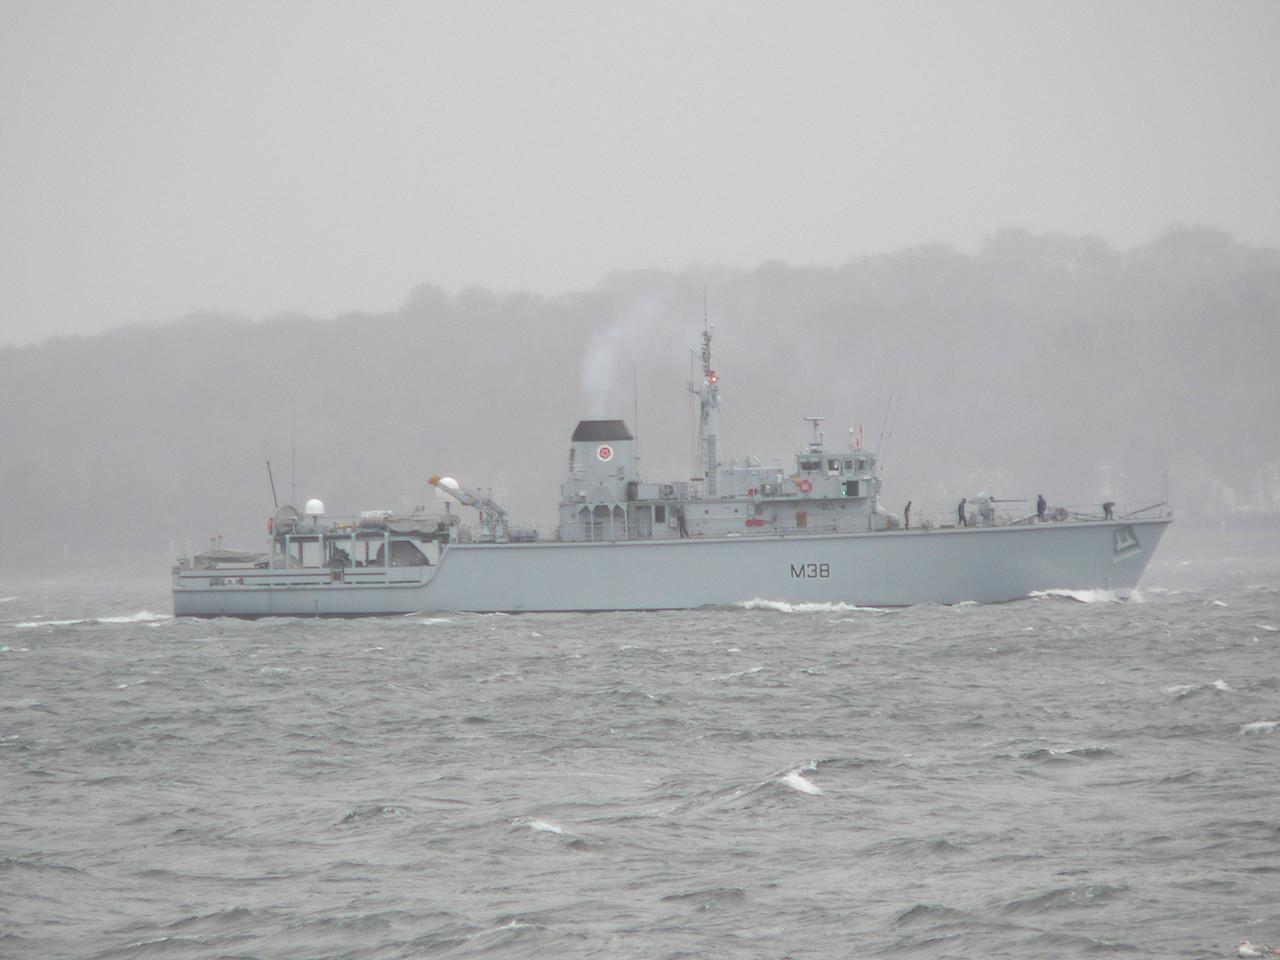 M-38 HMS ATHERSTONE